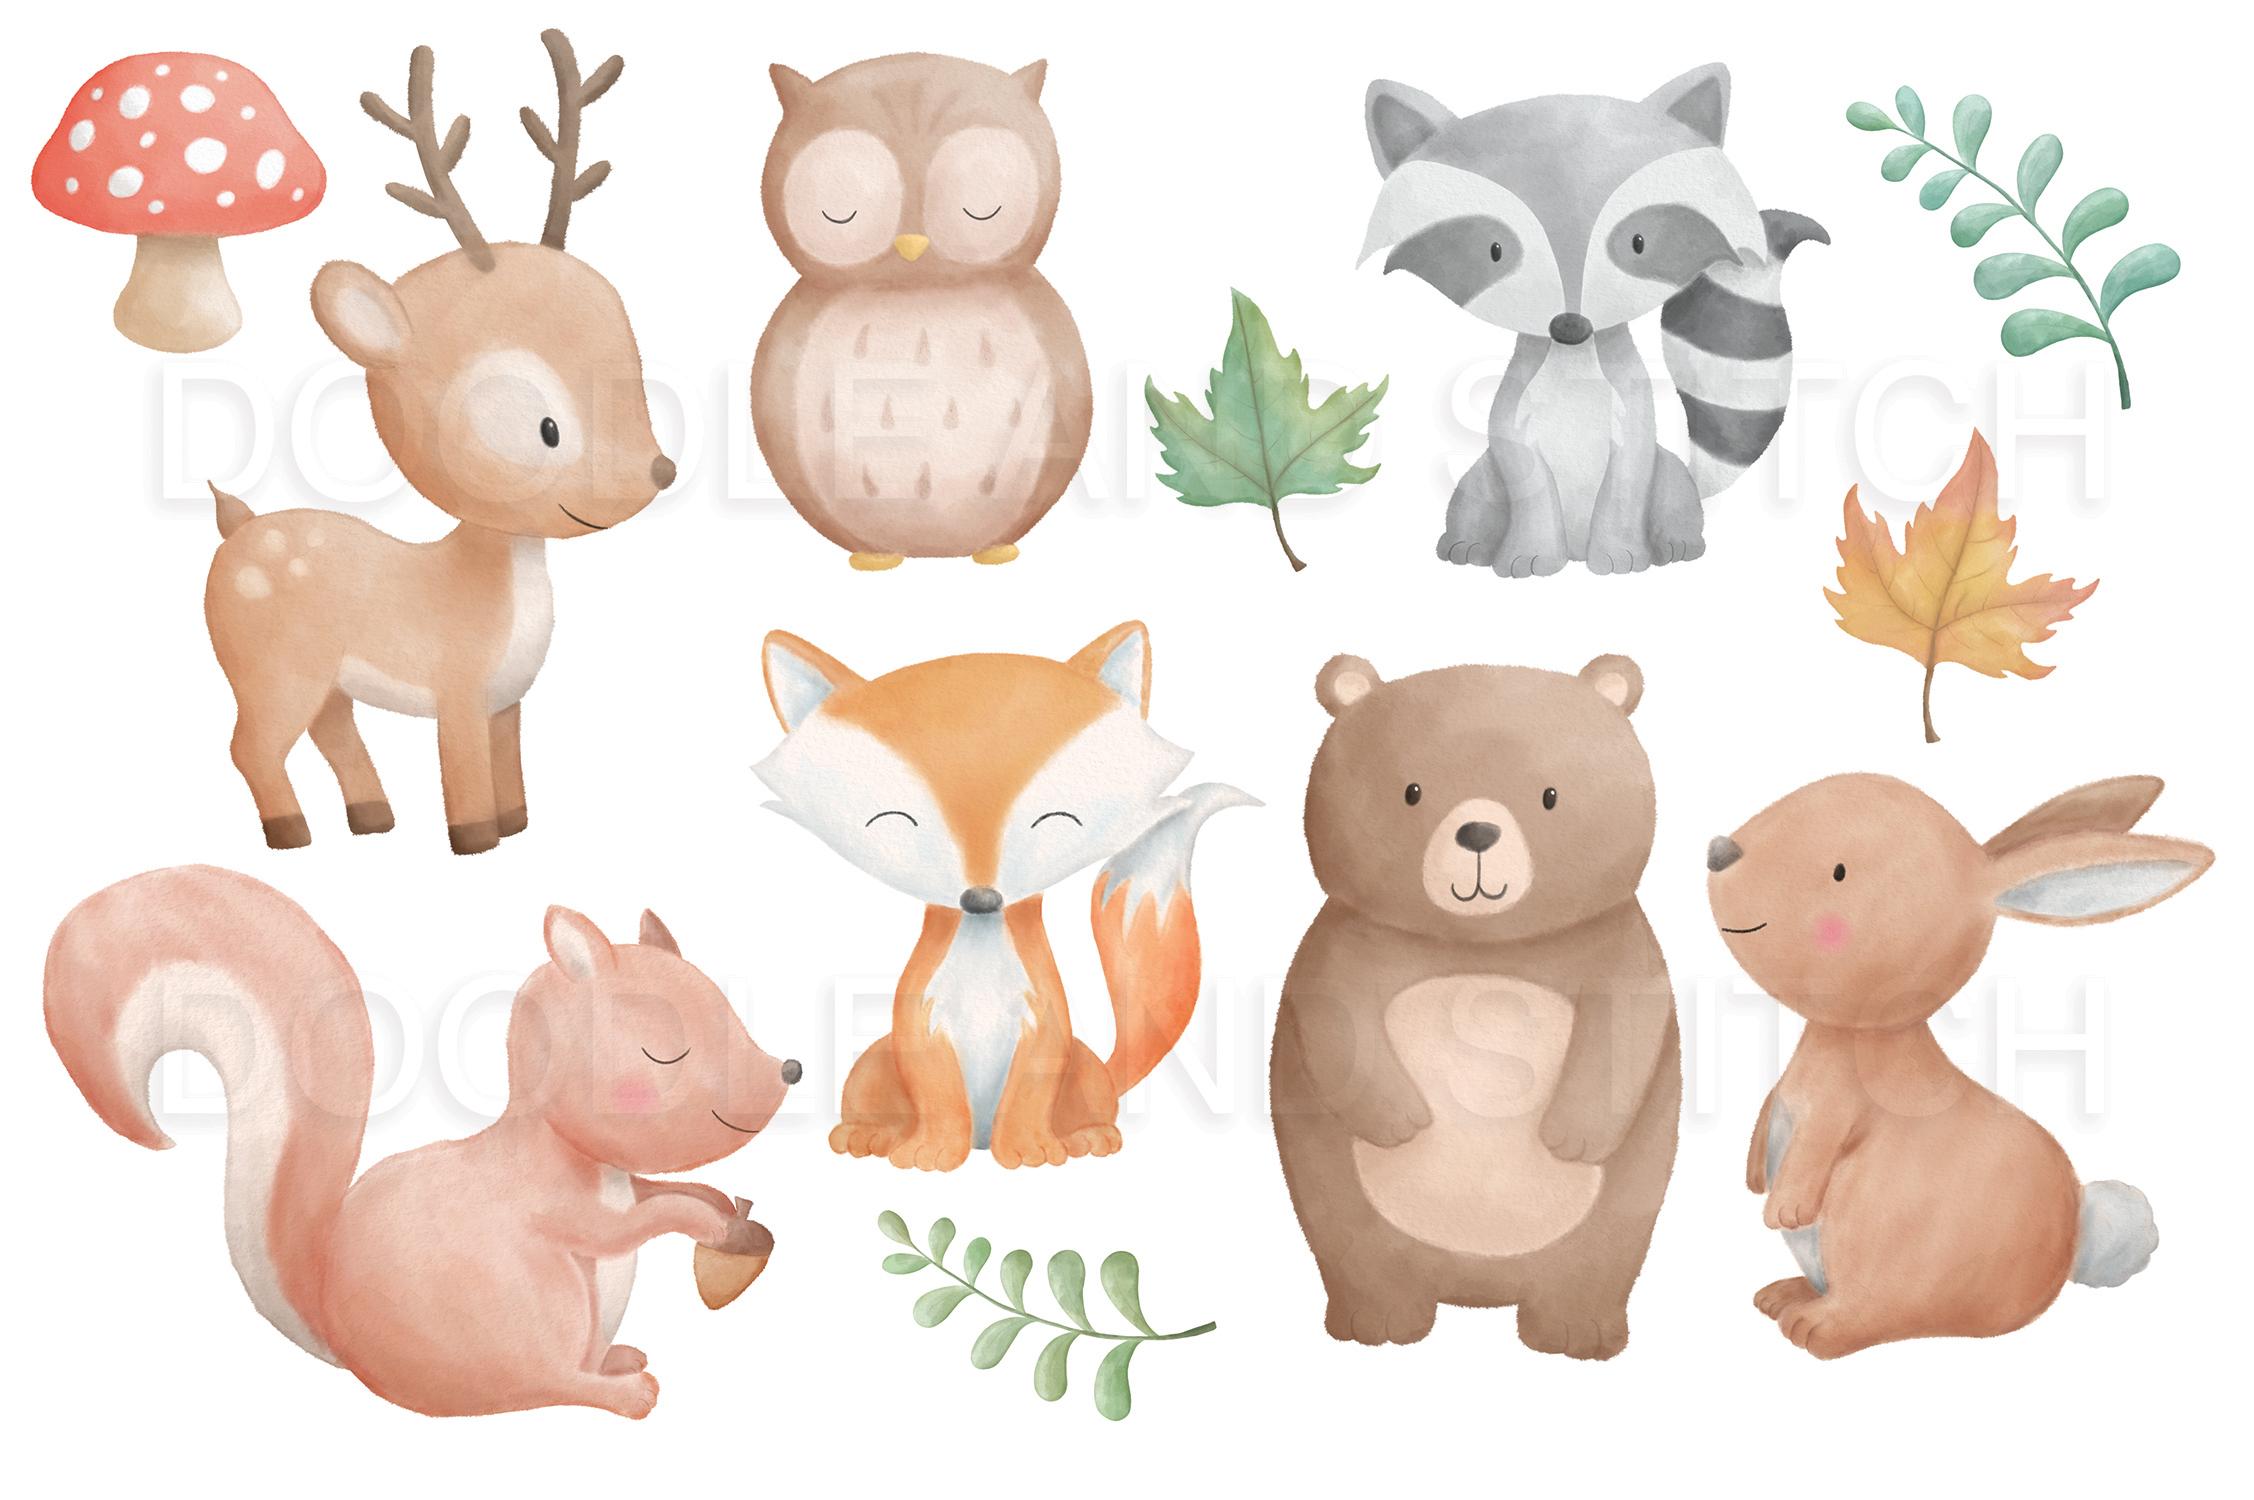 Watercolor Woodland Animal Designs example image 2